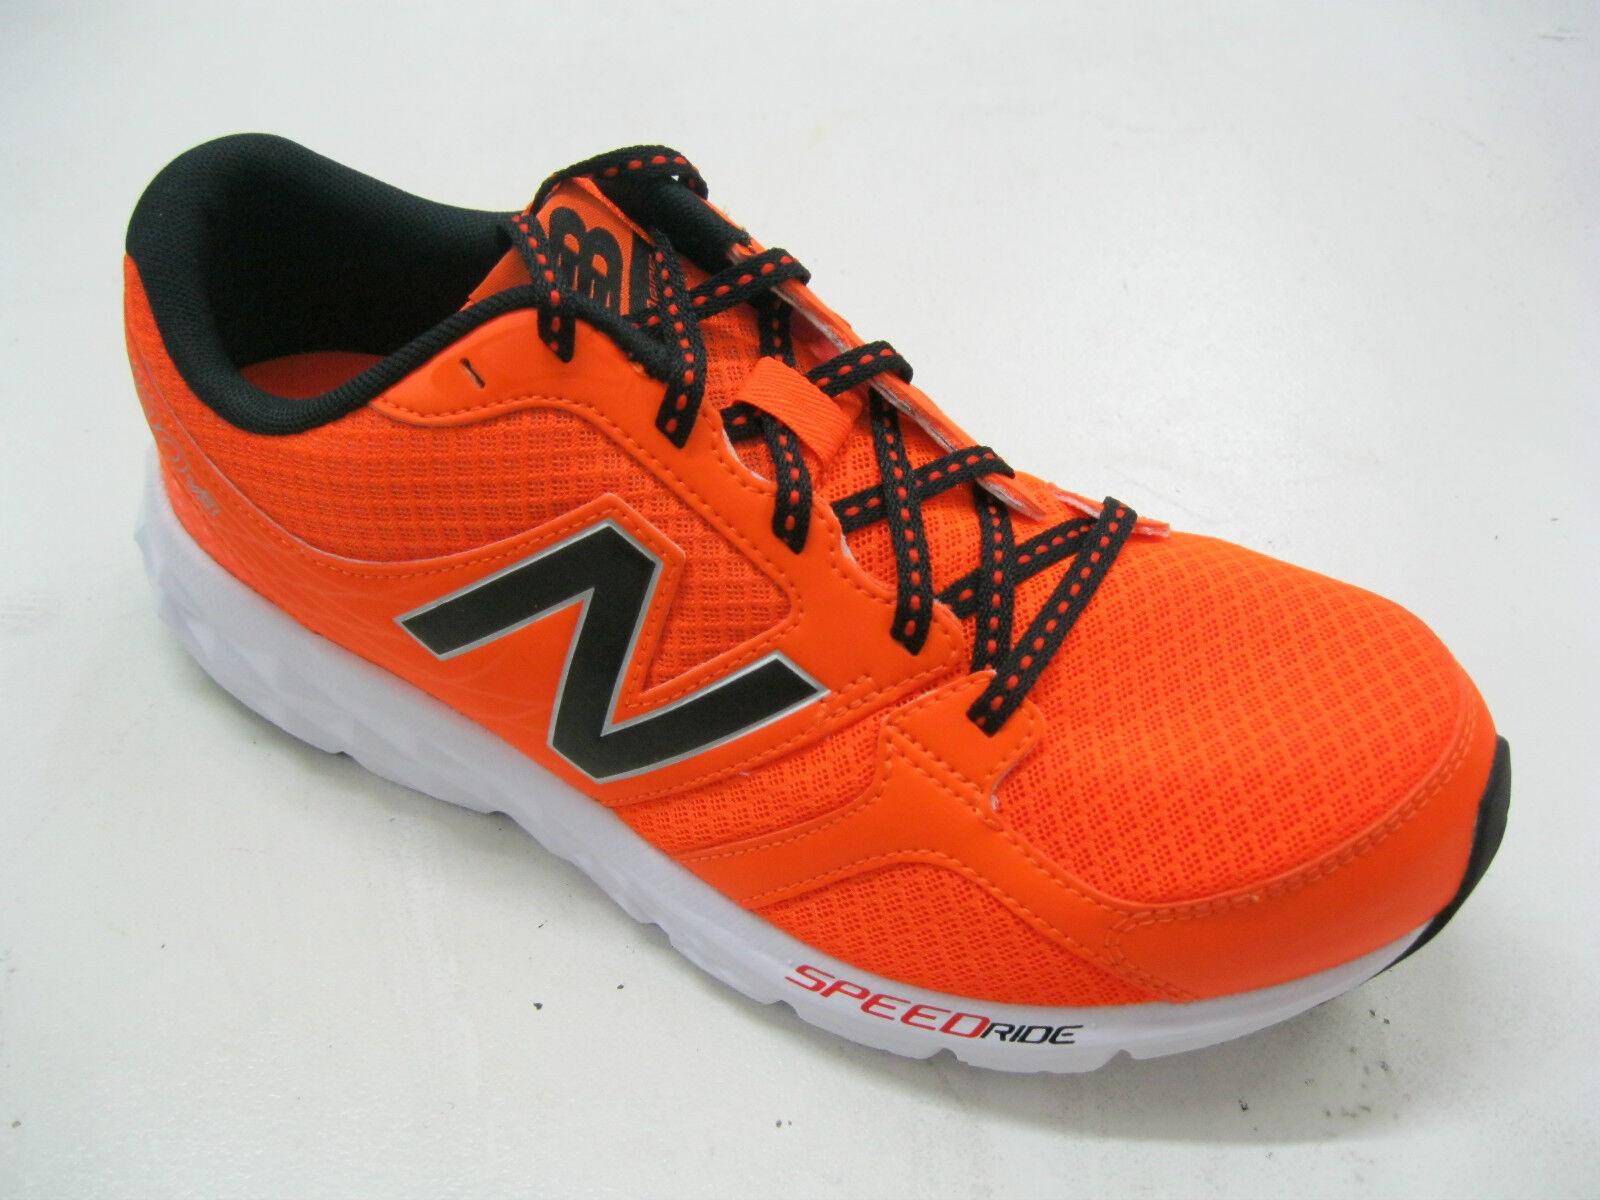 Scarpe da Ginnastica uomo New Balance M490CL3 Running Course